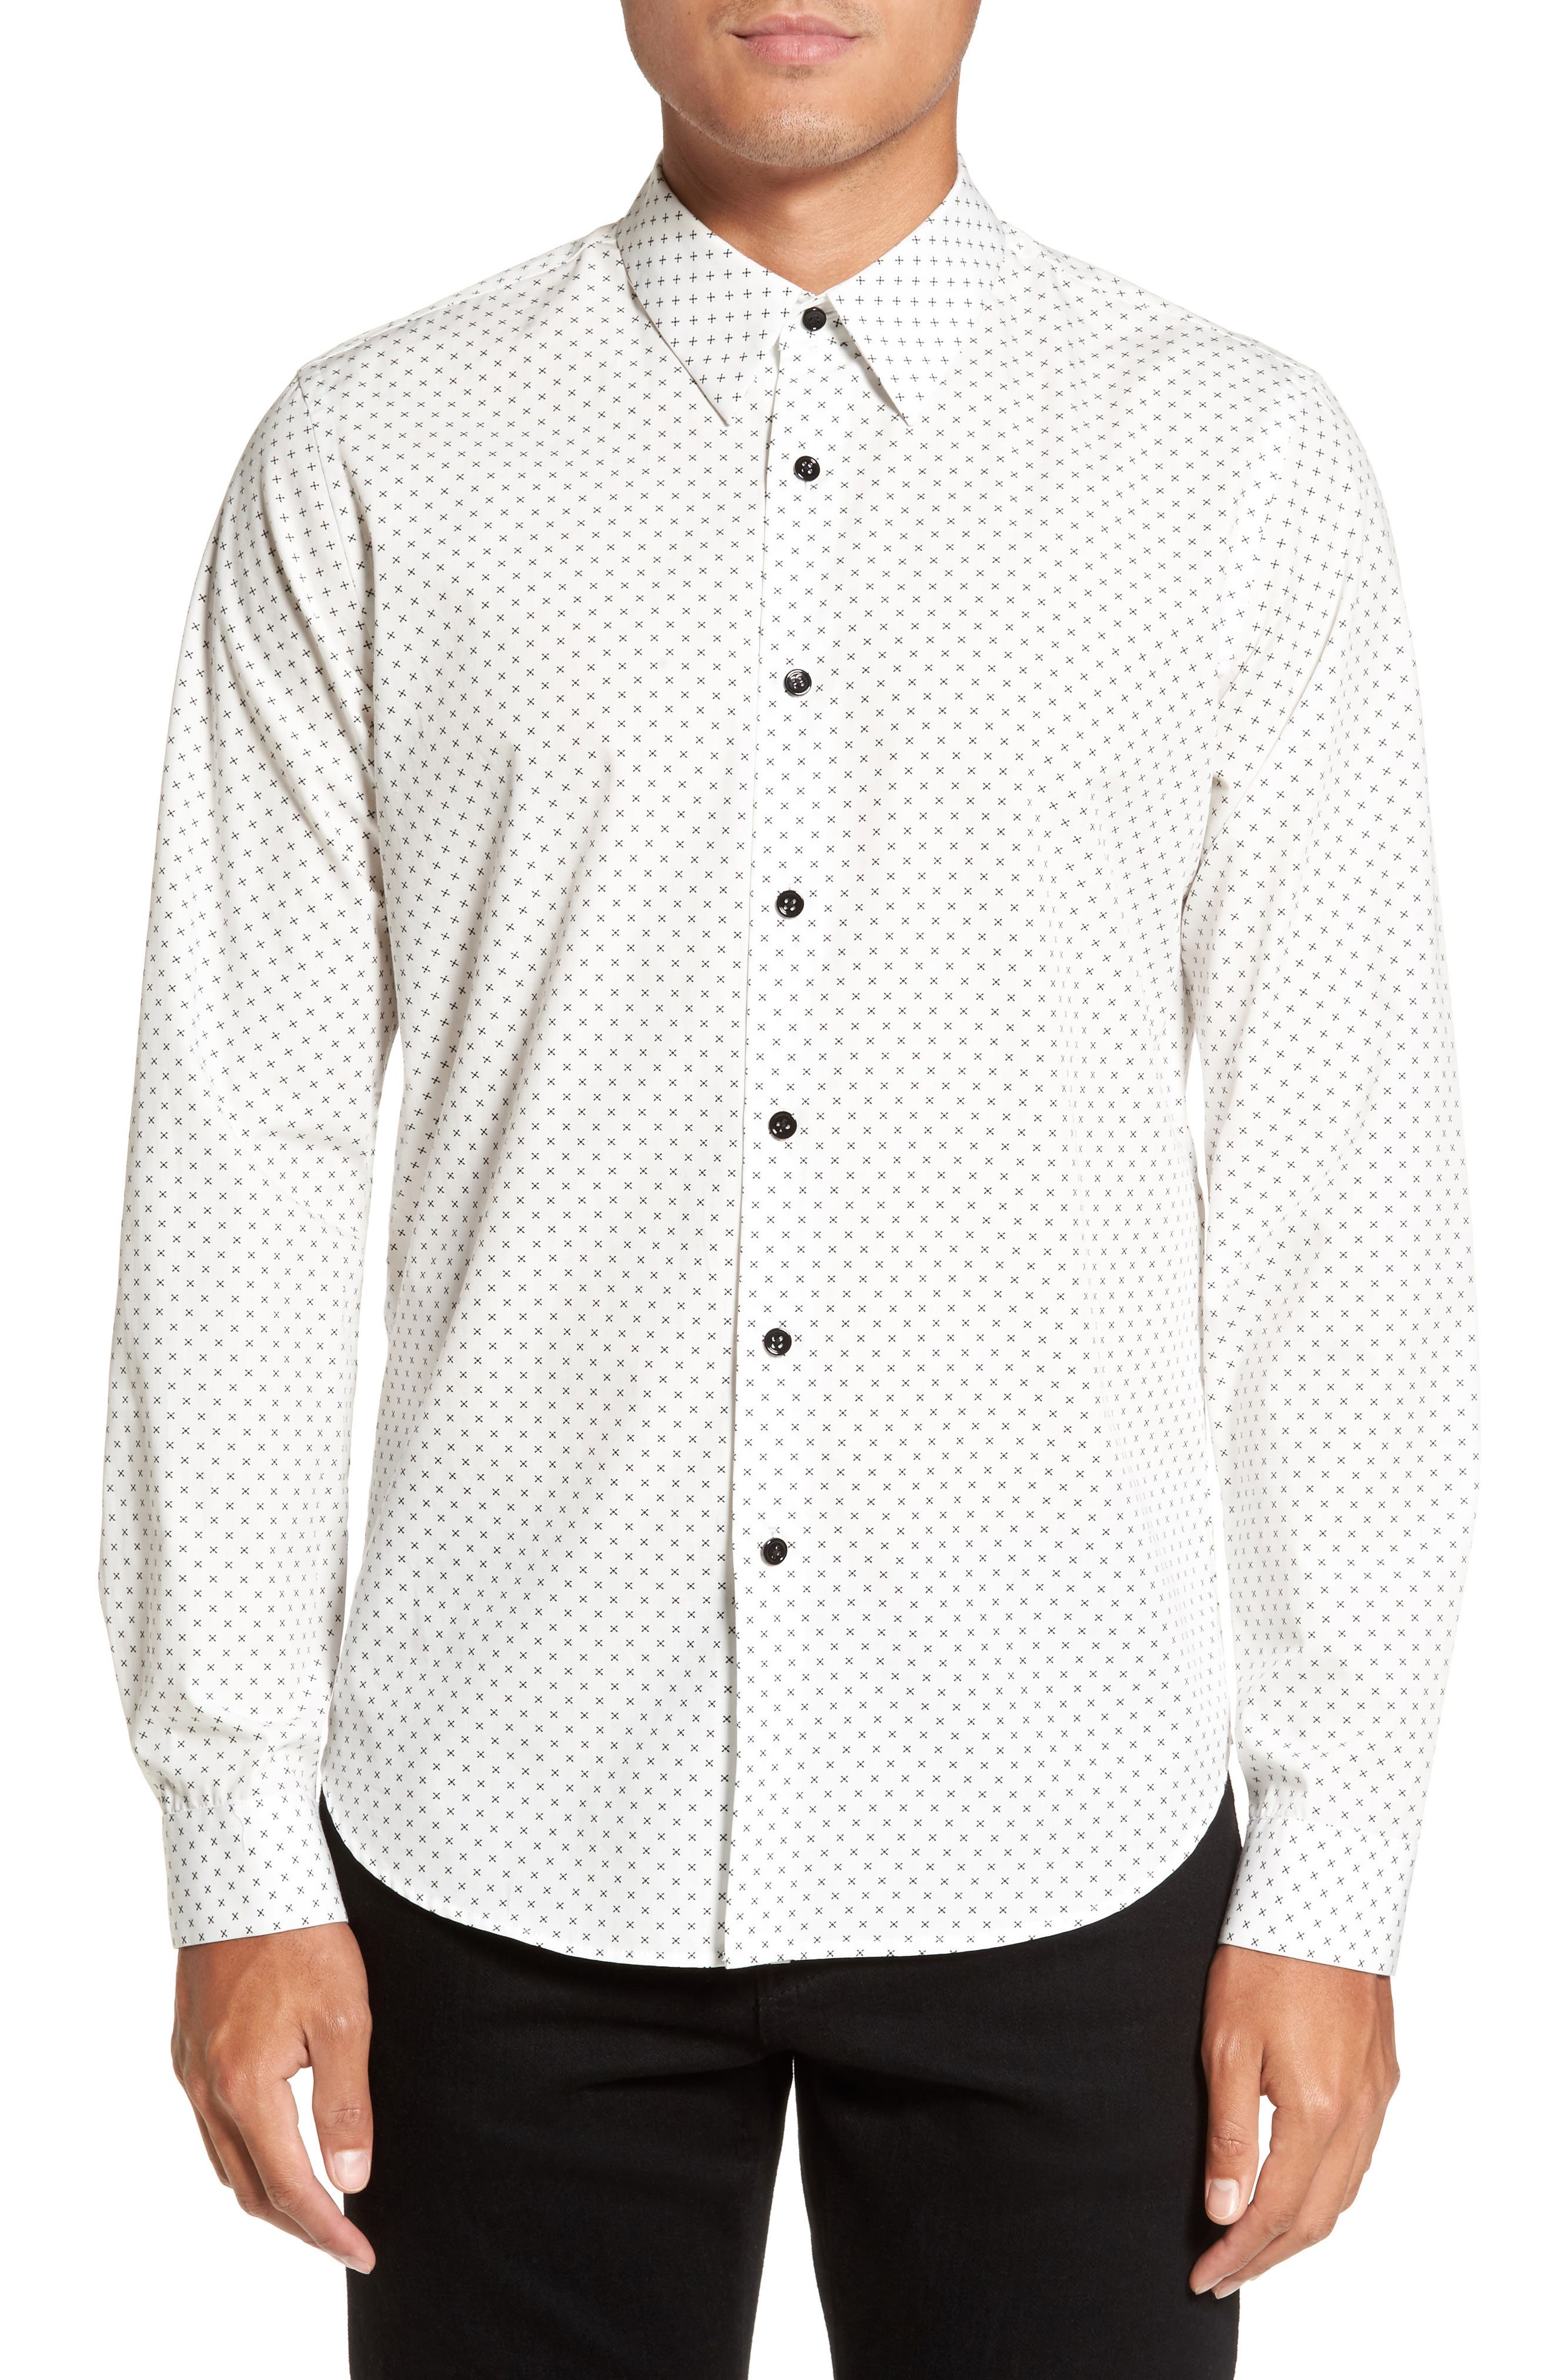 Stitch Print Sport Shirt,                             Main thumbnail 1, color,                             Ivory Multi